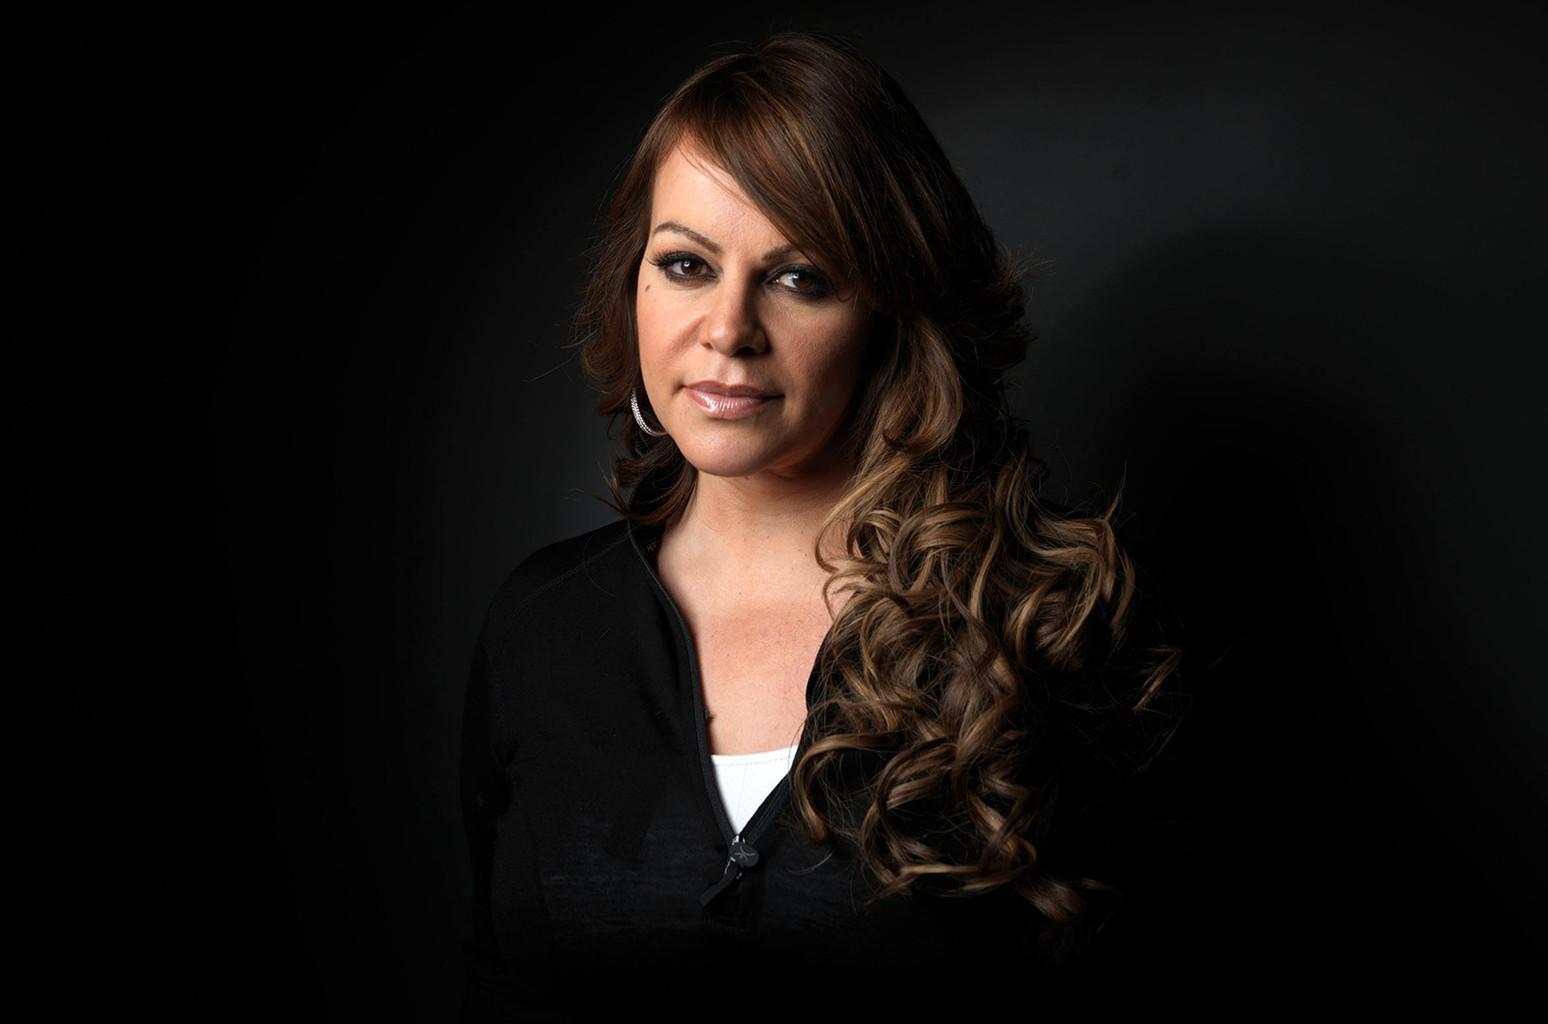 Jenni Rivera in 2012